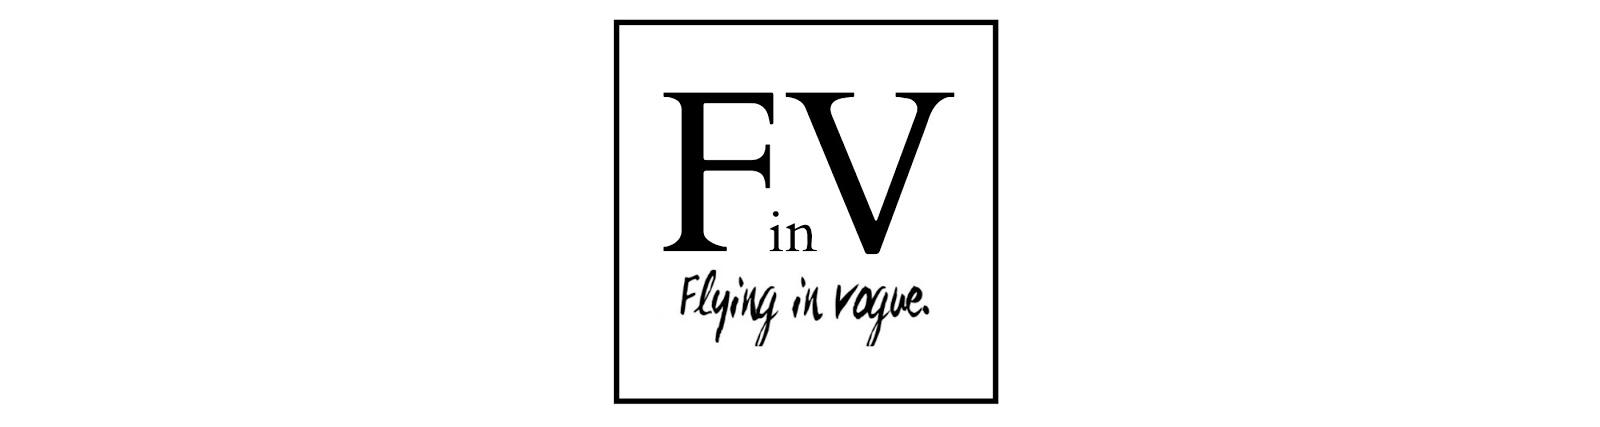 https://twitter.com/Flyinginvogue